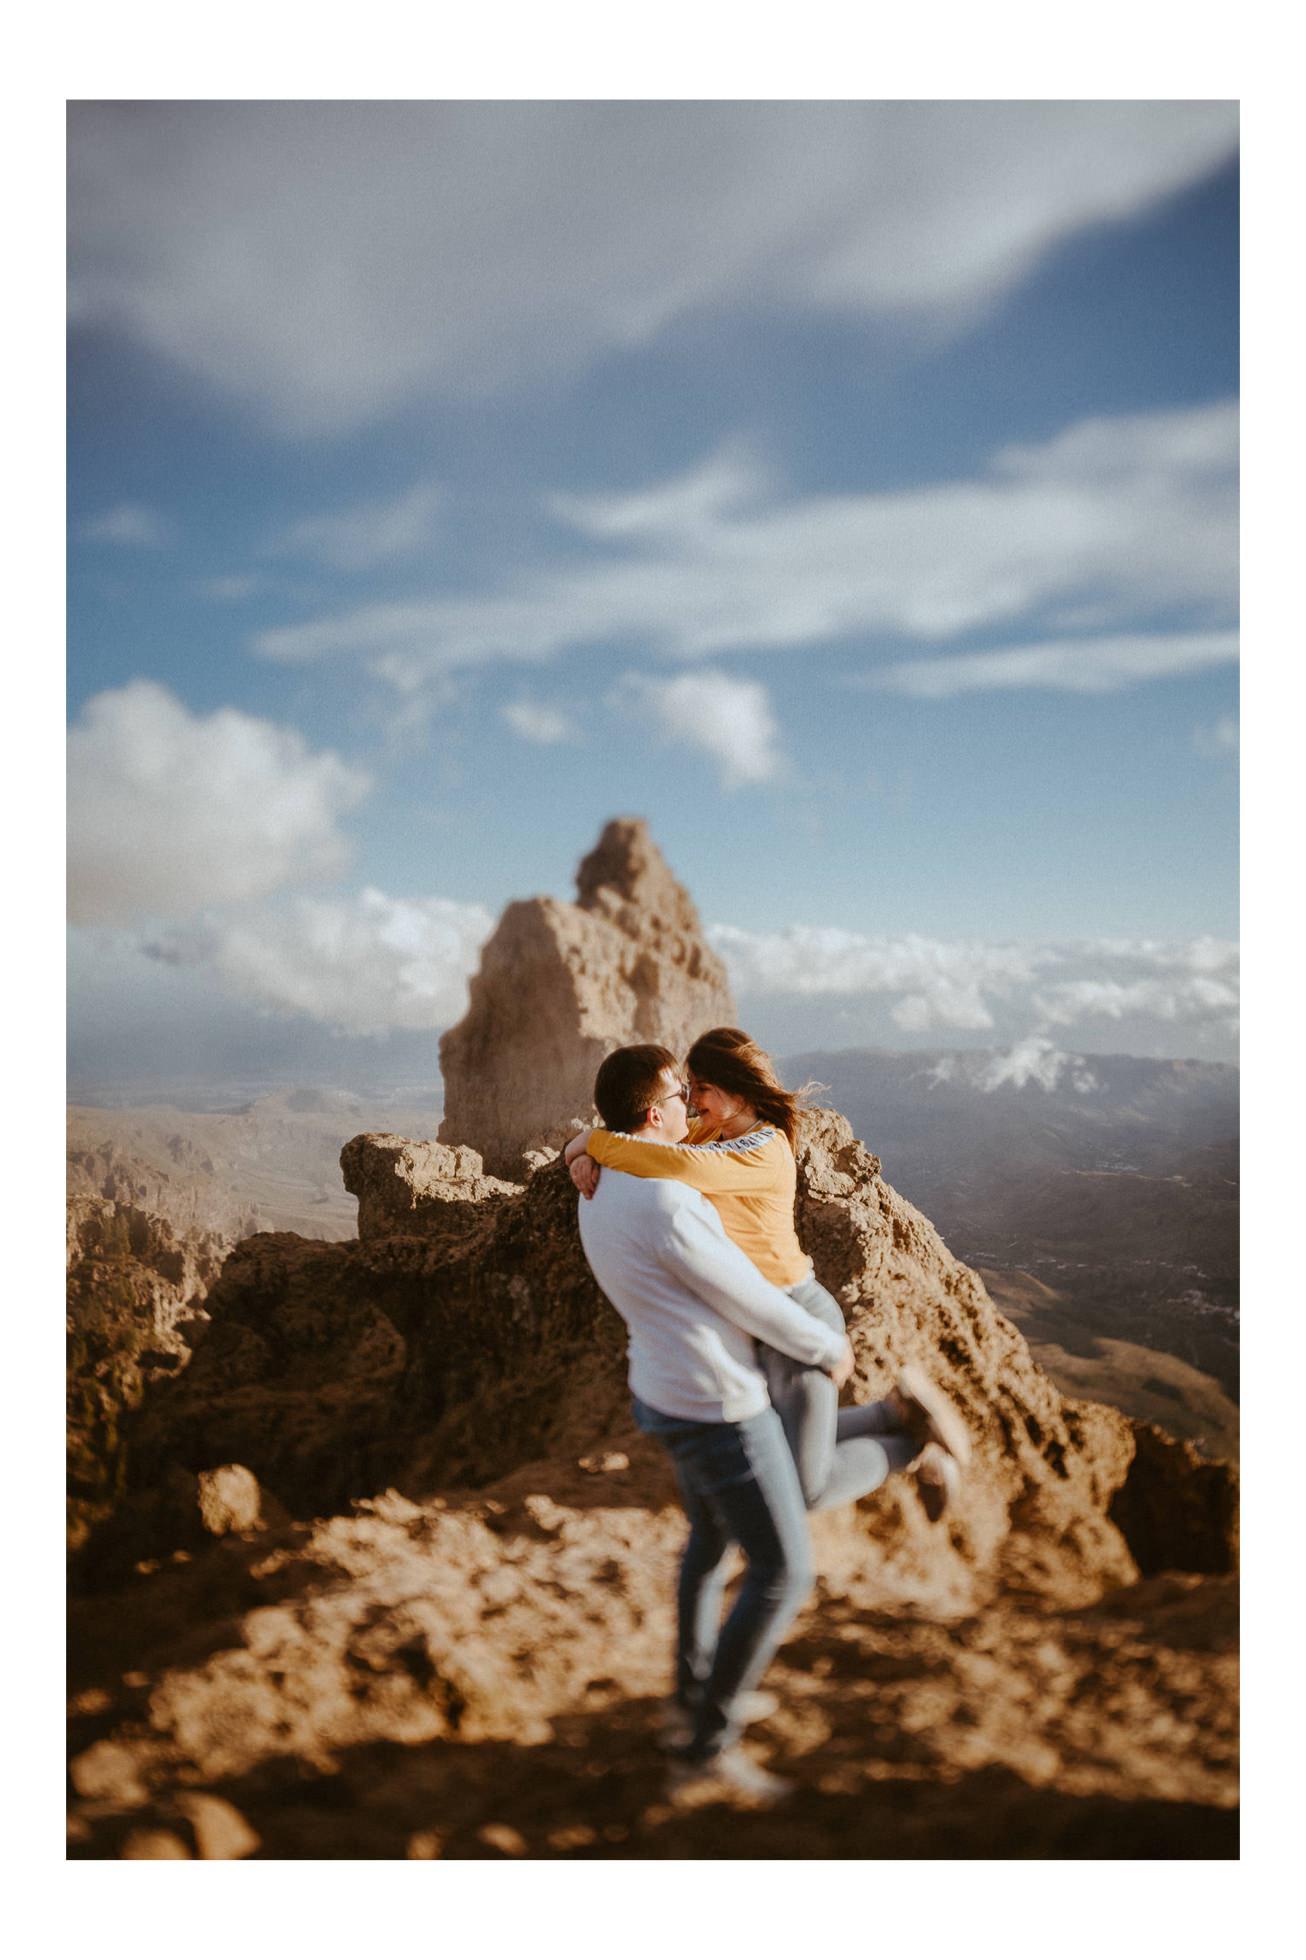 Canary islands Pico Nieves Gran Canaria Photographer 6